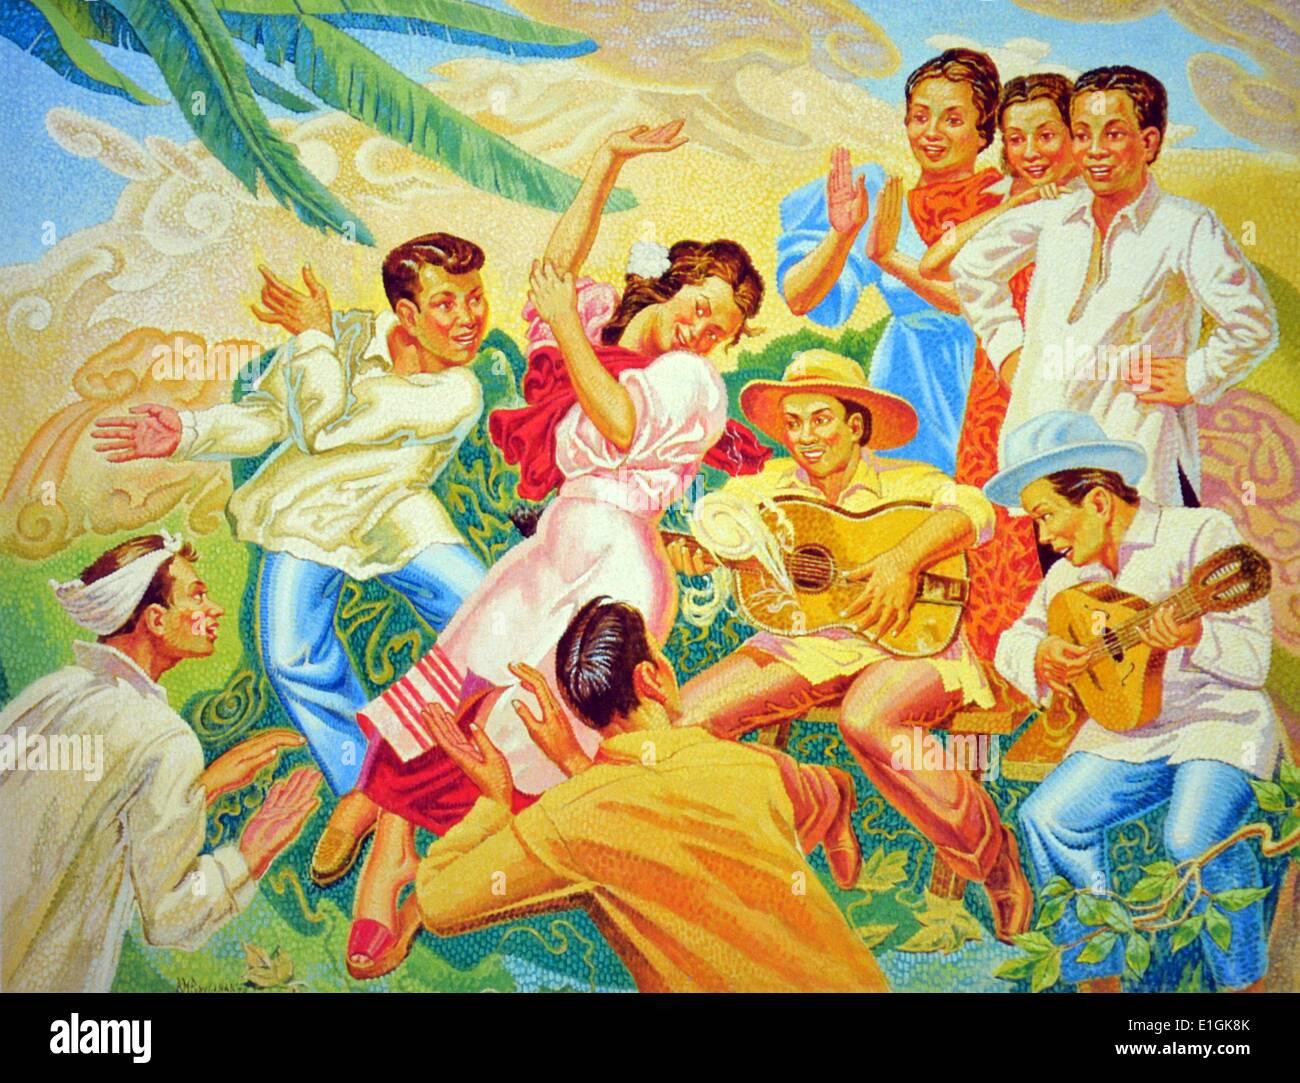 Ricarte M Puruganan 'Doon Po Sa amin' (there we go) 1979, Oil on canvas - Stock Image